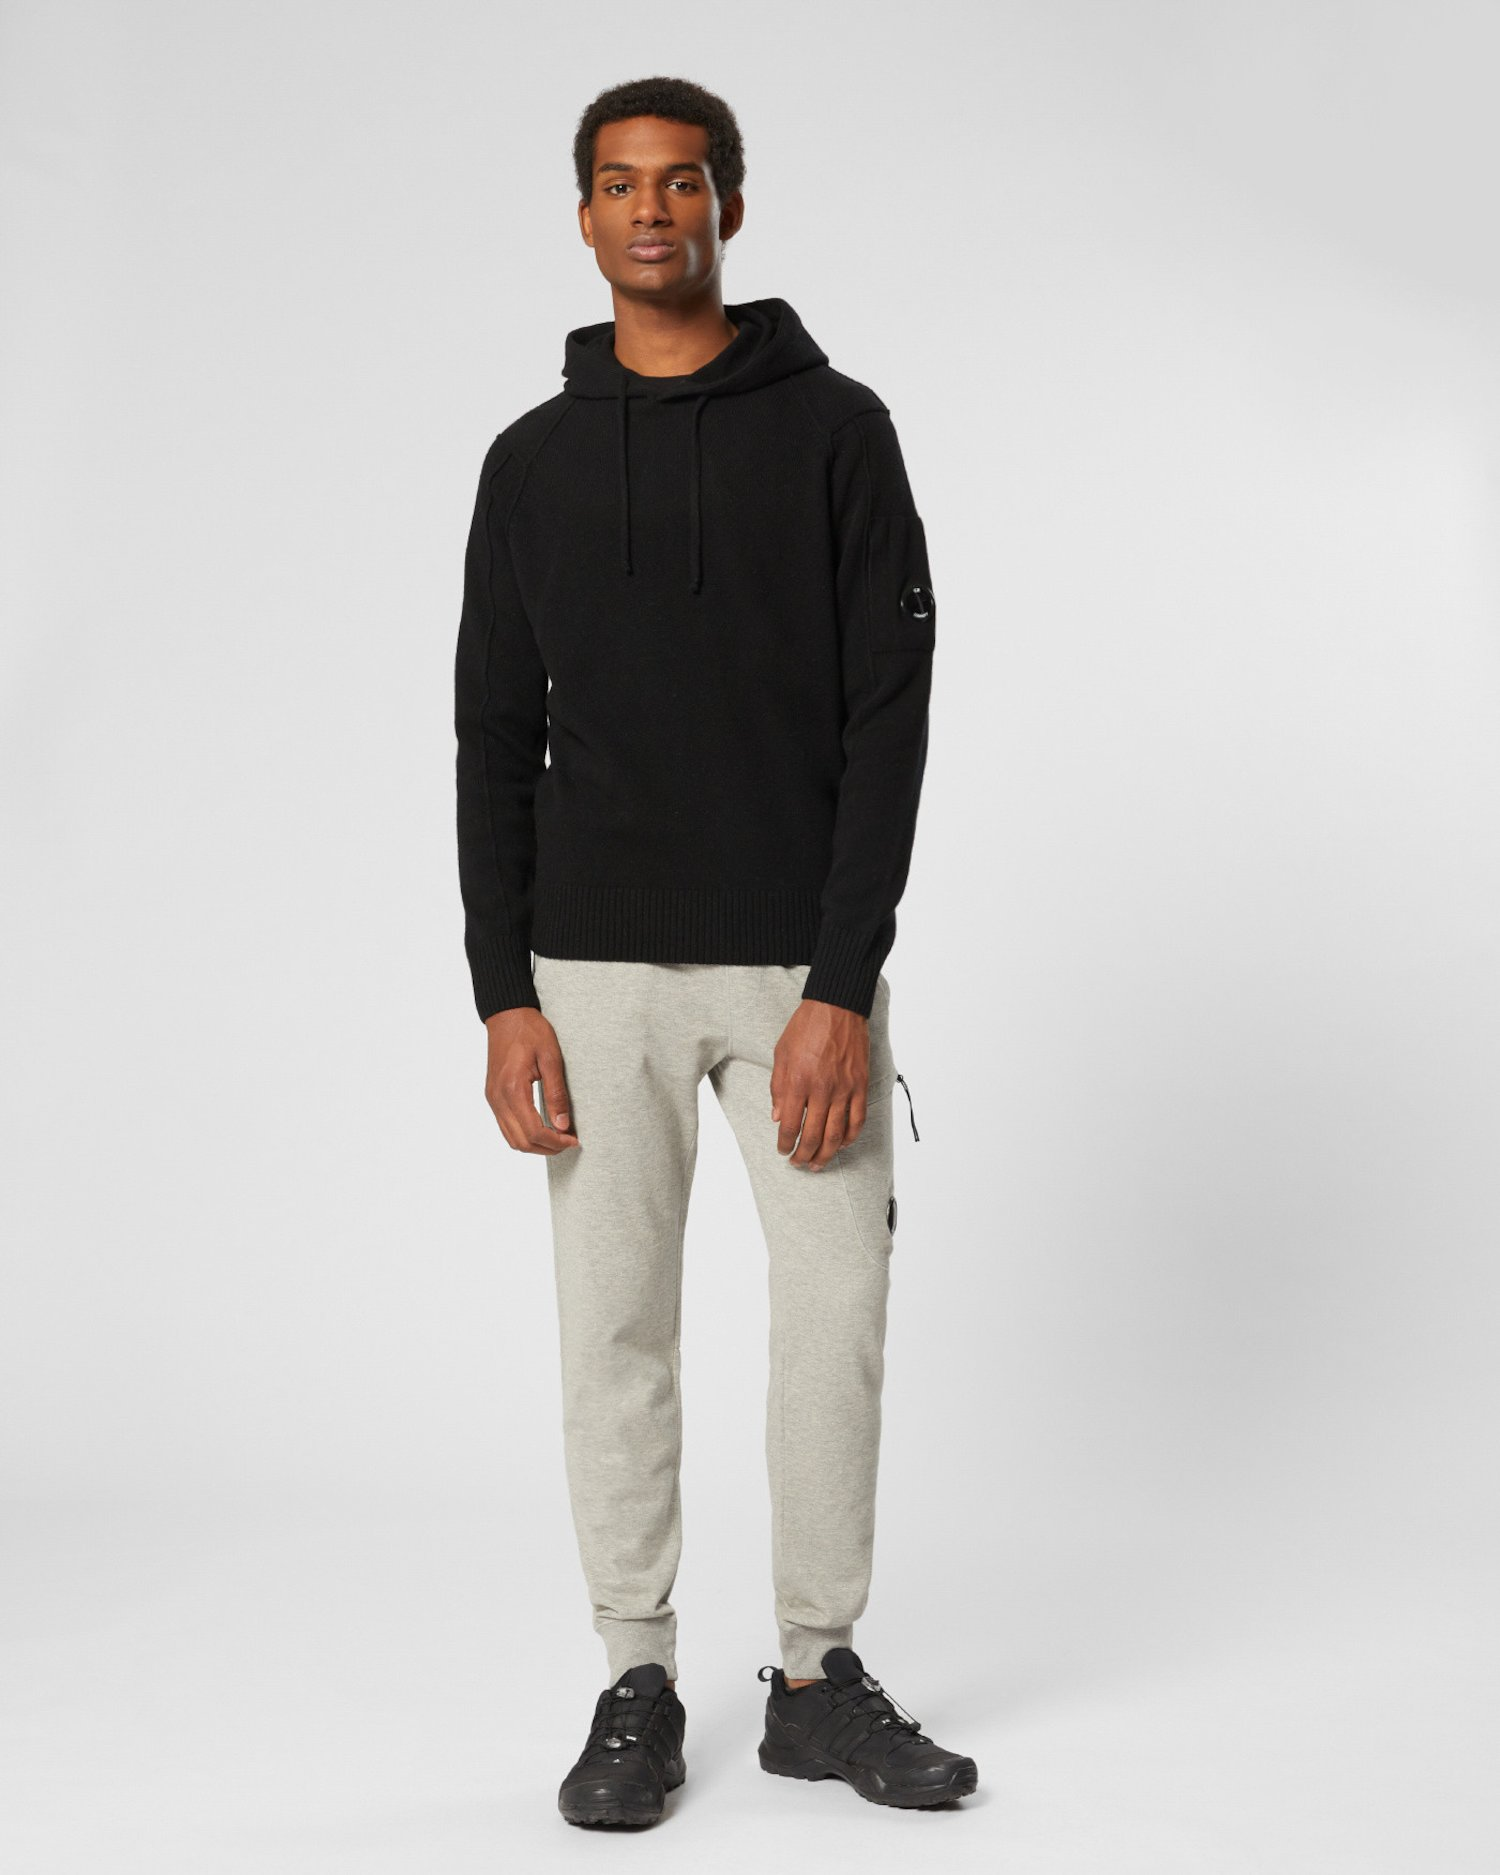 Garment Dyed Light Fleece Lens Pocket Sweatpants